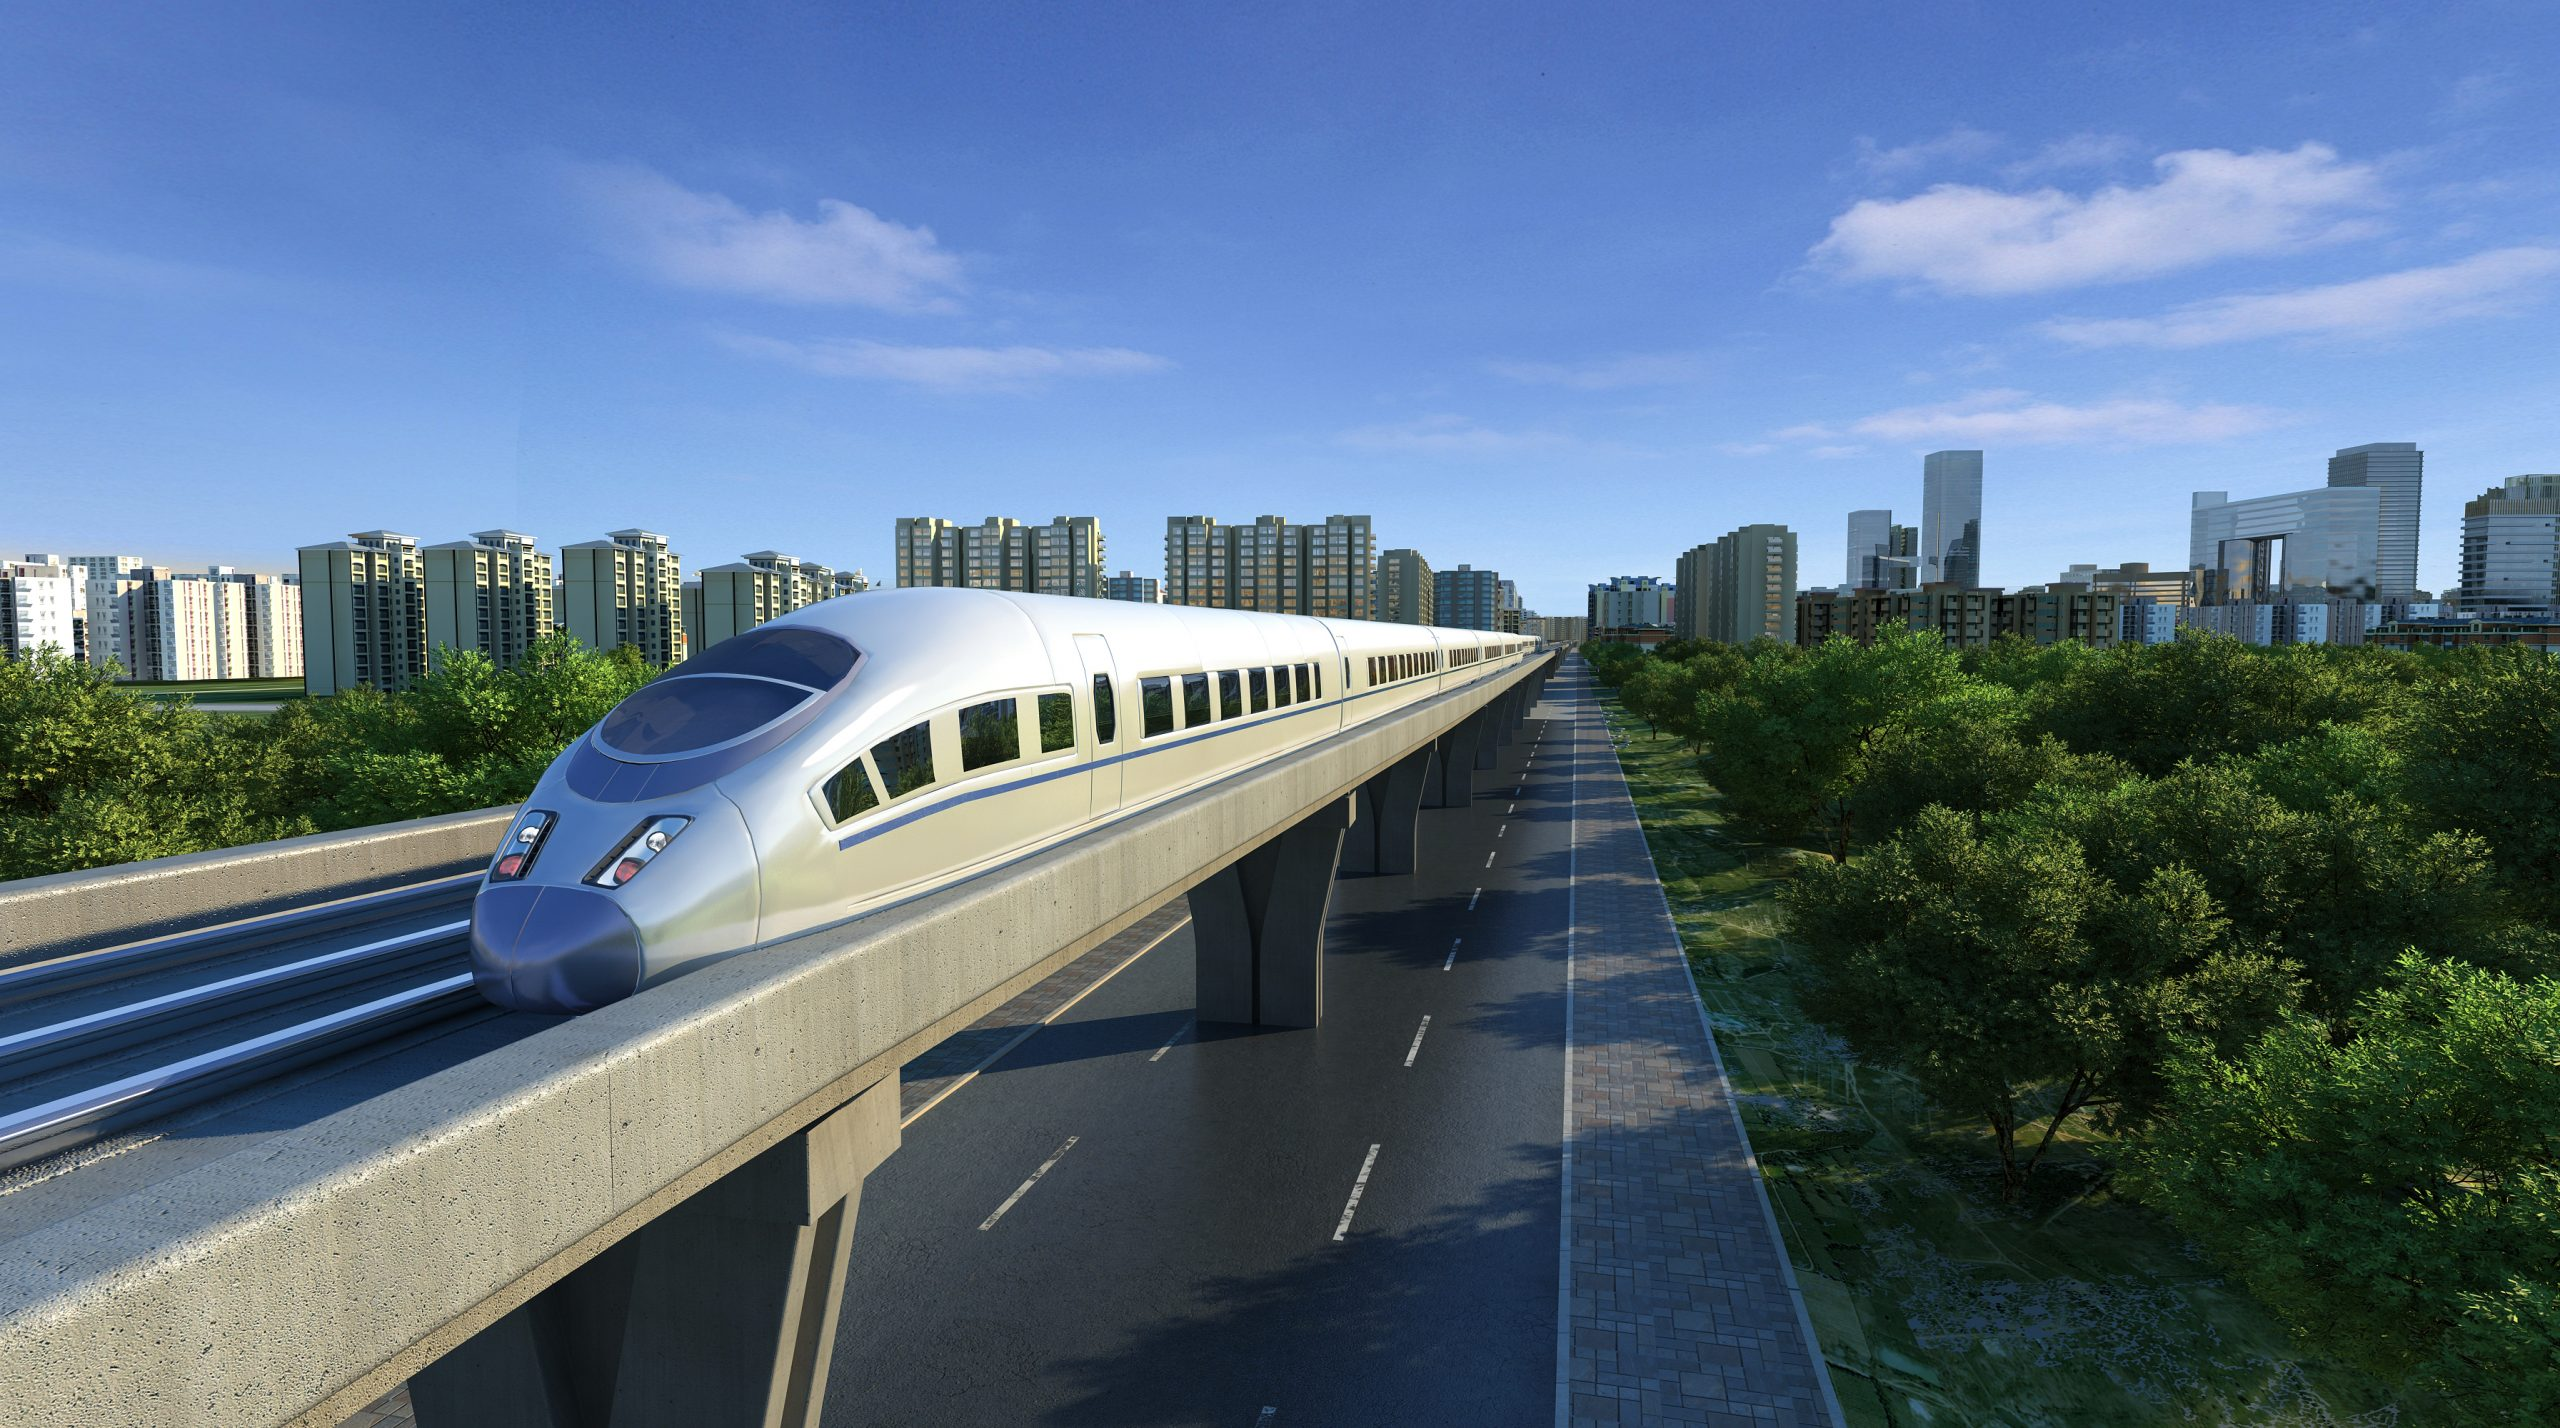 Application of KSCAN-MAGIC 3D Scanner in Railway Bridge Inspection 1